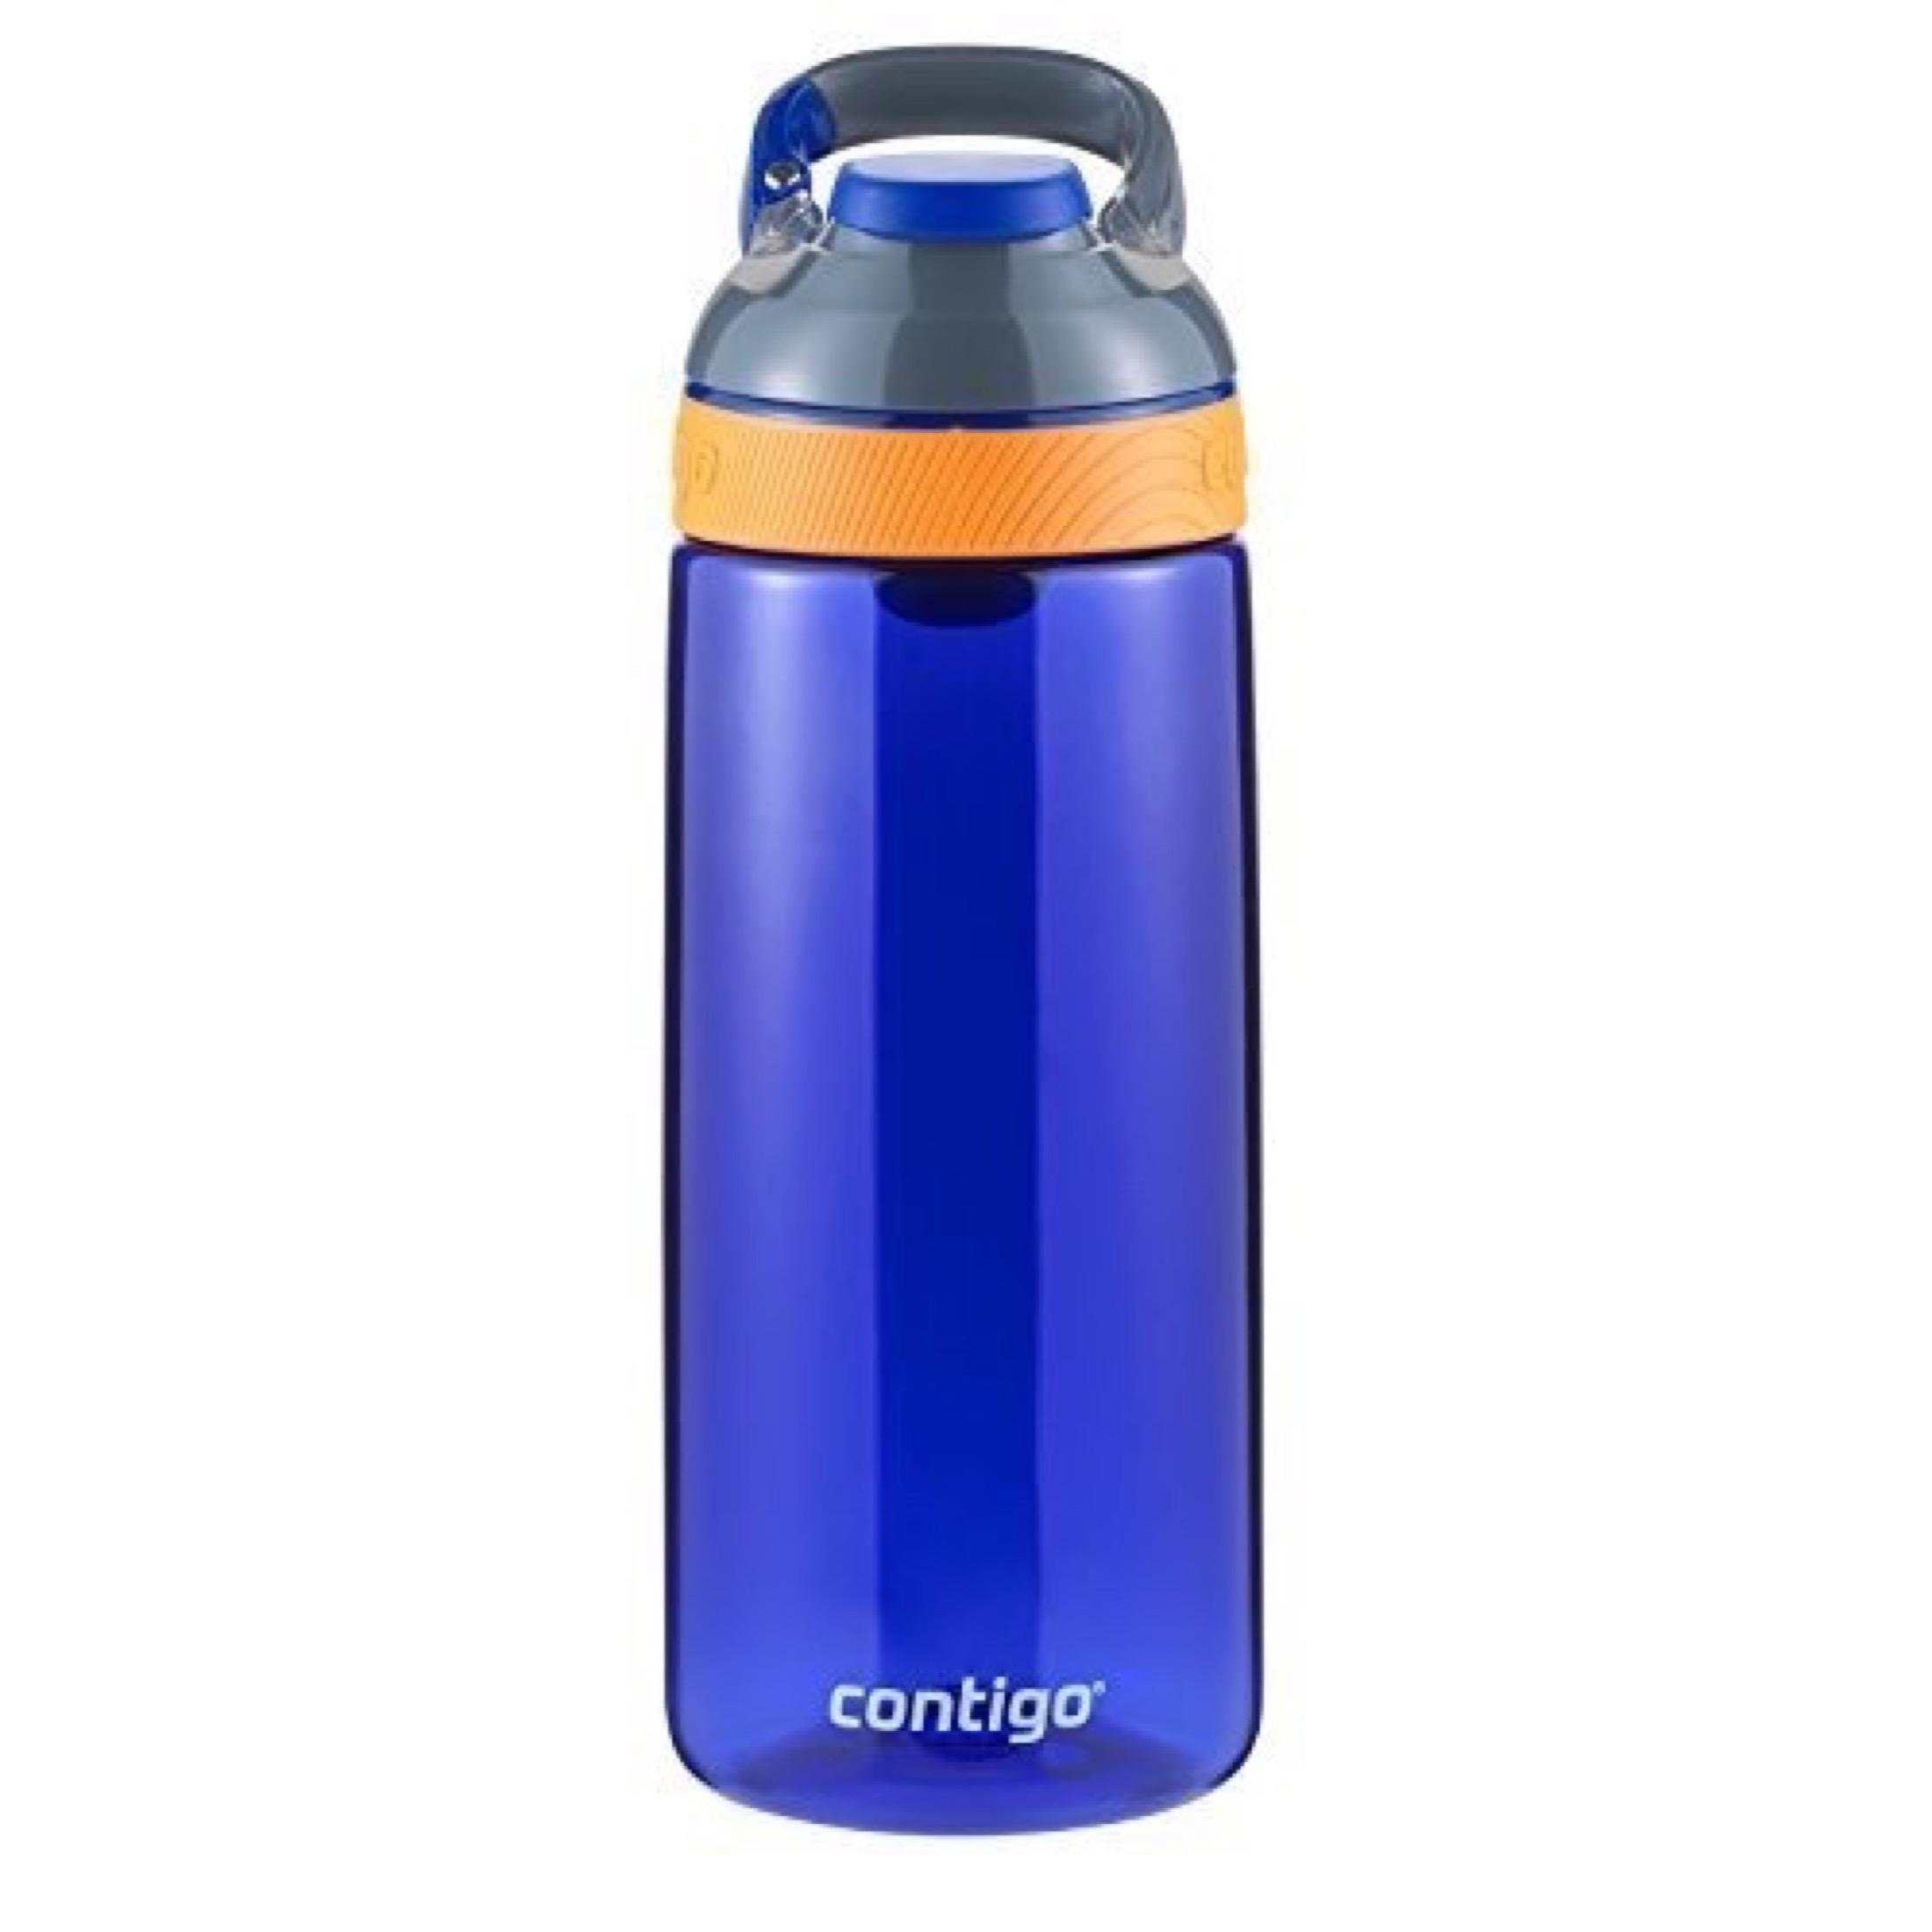 Kids 3 x Contigo Spill-Proof Water Drinks Bottles Bpa Free New 2020 blues